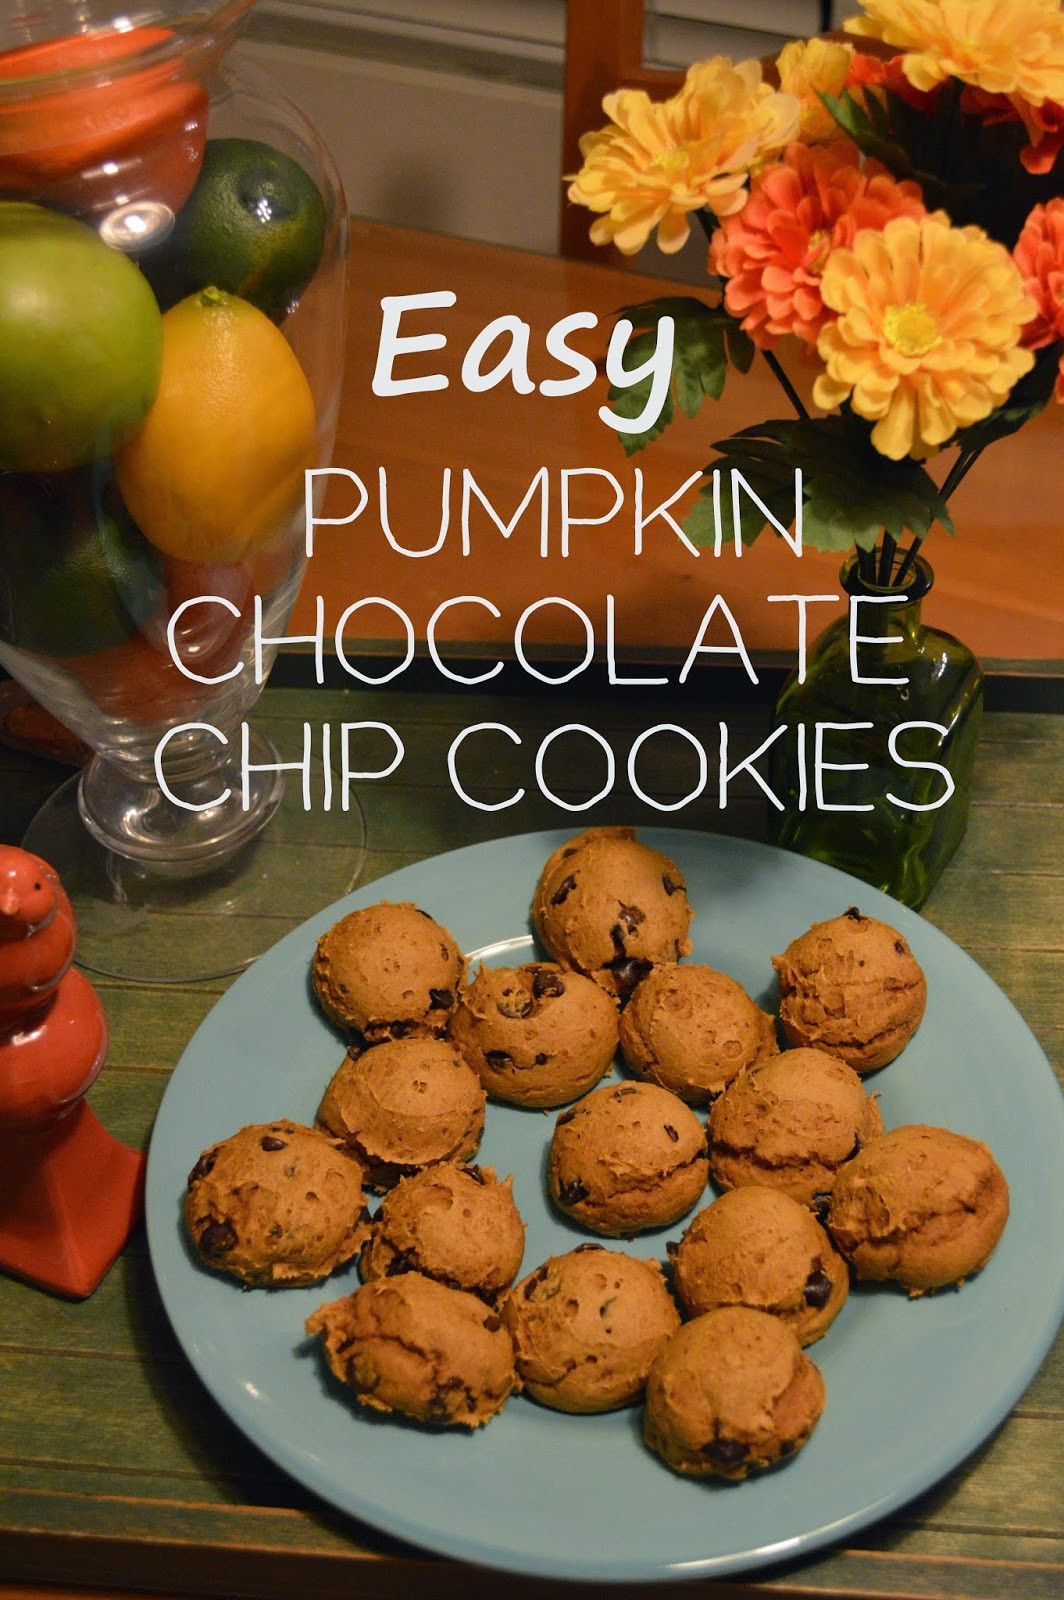 Easy Pumpkin Chocolate Chip Cookies  easy pumpkin chocolate chip cookies Alyssa Dawson Blog